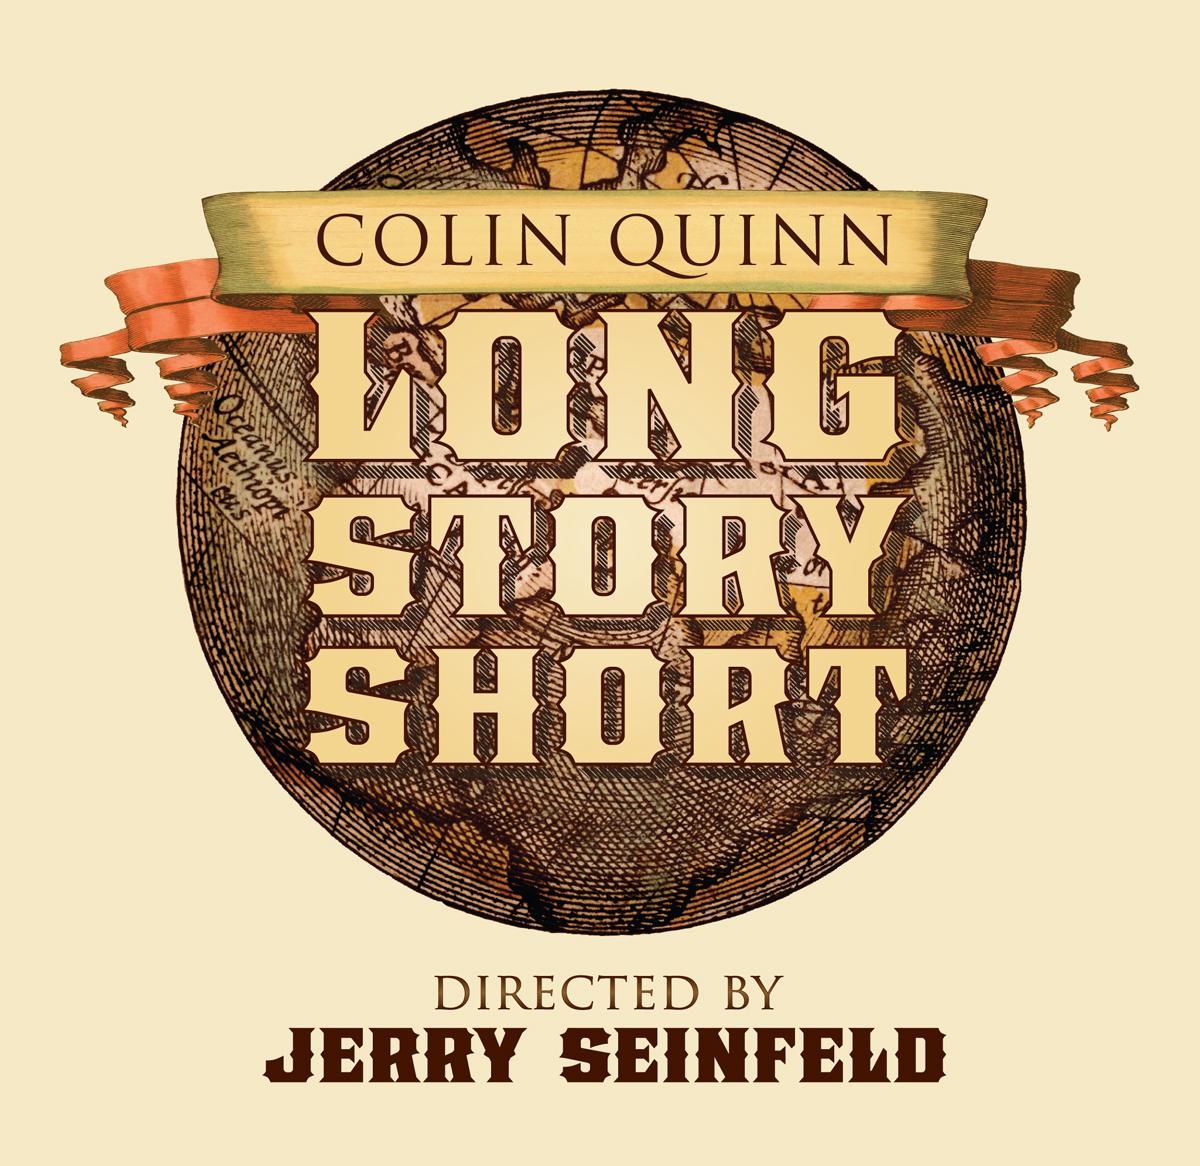 Colin Quinn the long story short.jpg